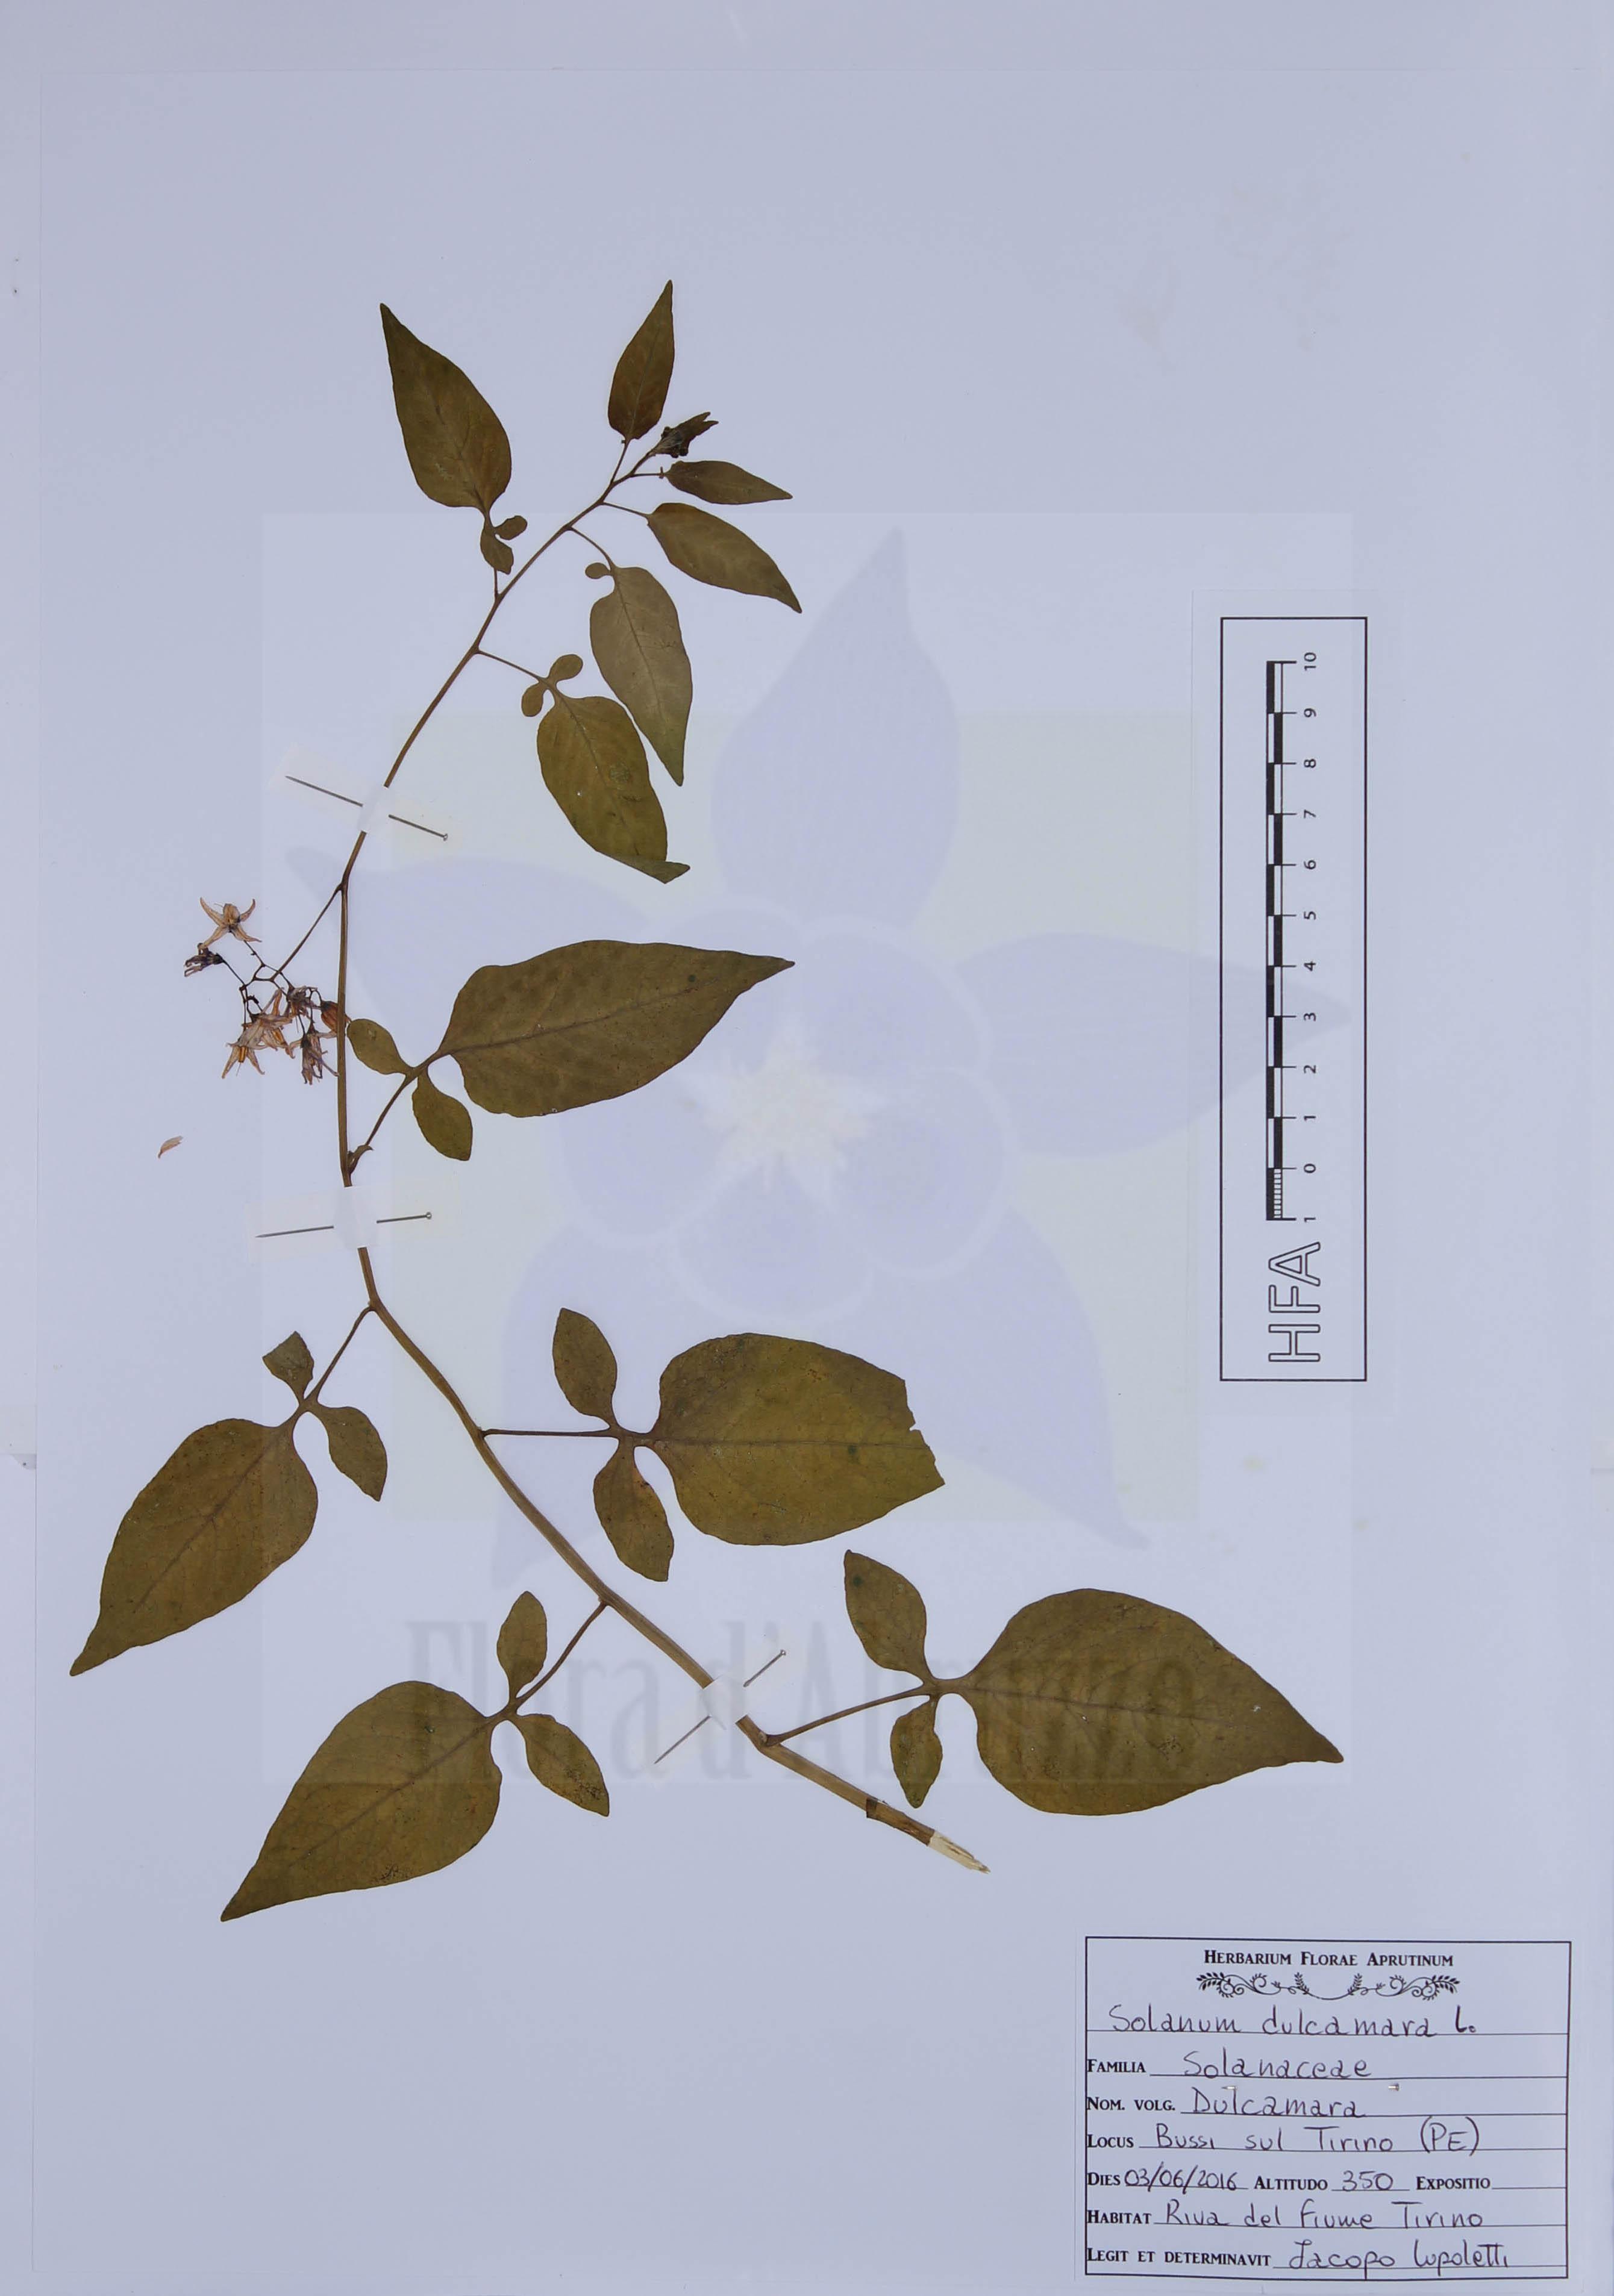 Solanum dulcamara L.